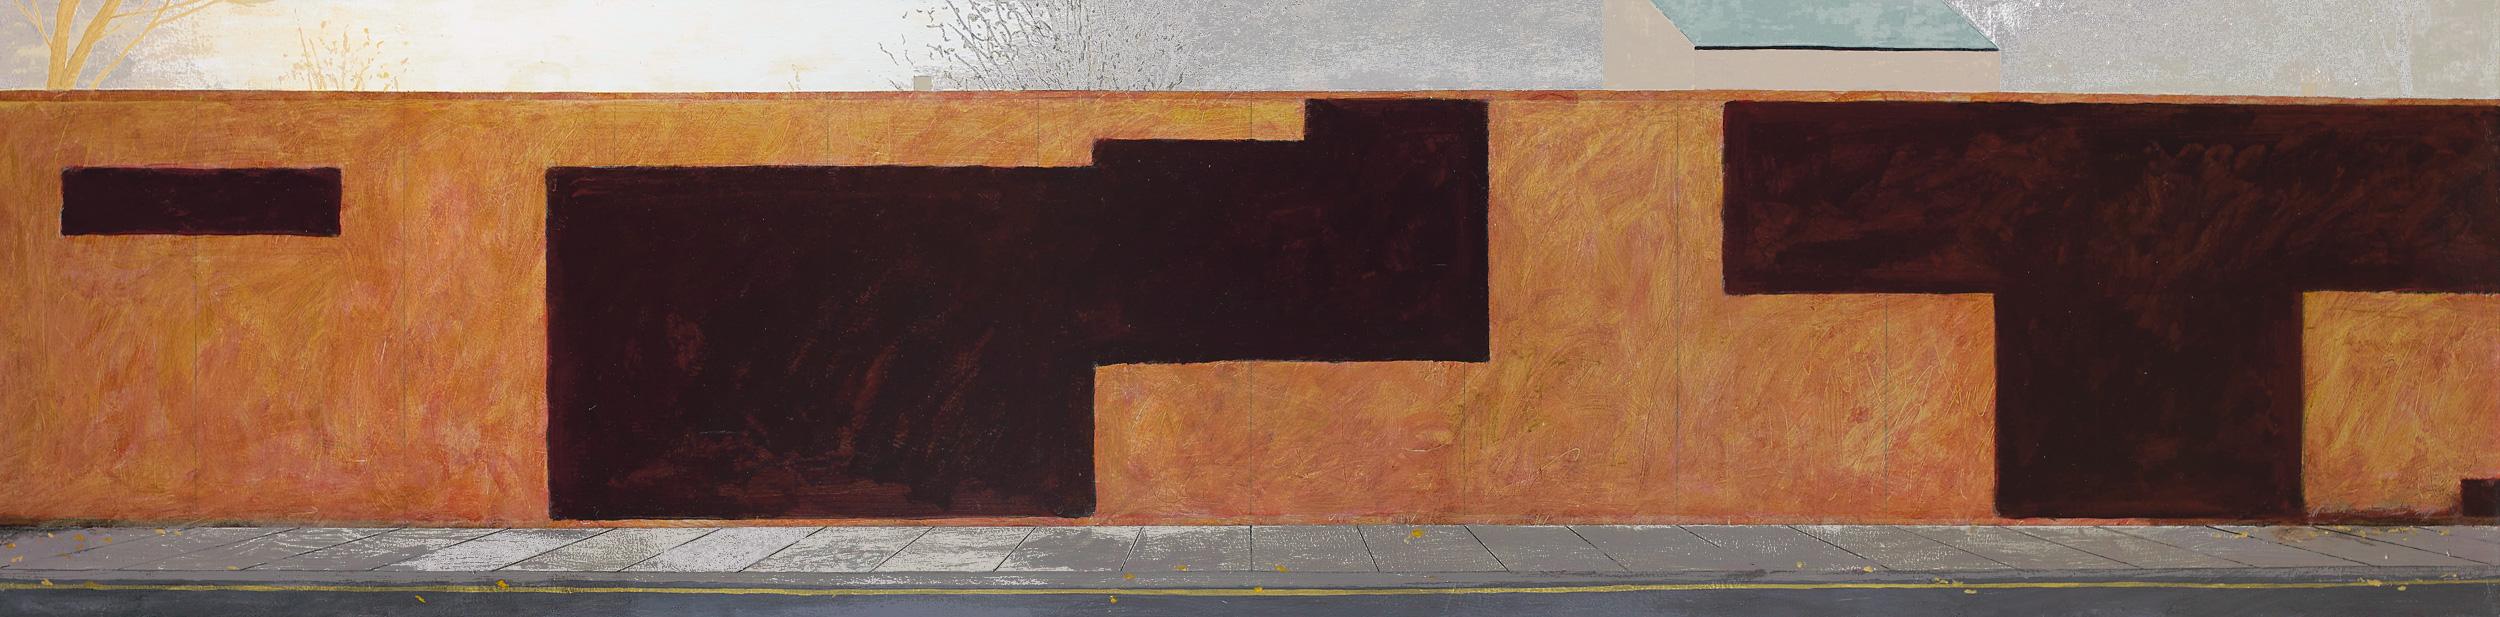 Richard Serra in Southampton Way, Peckham